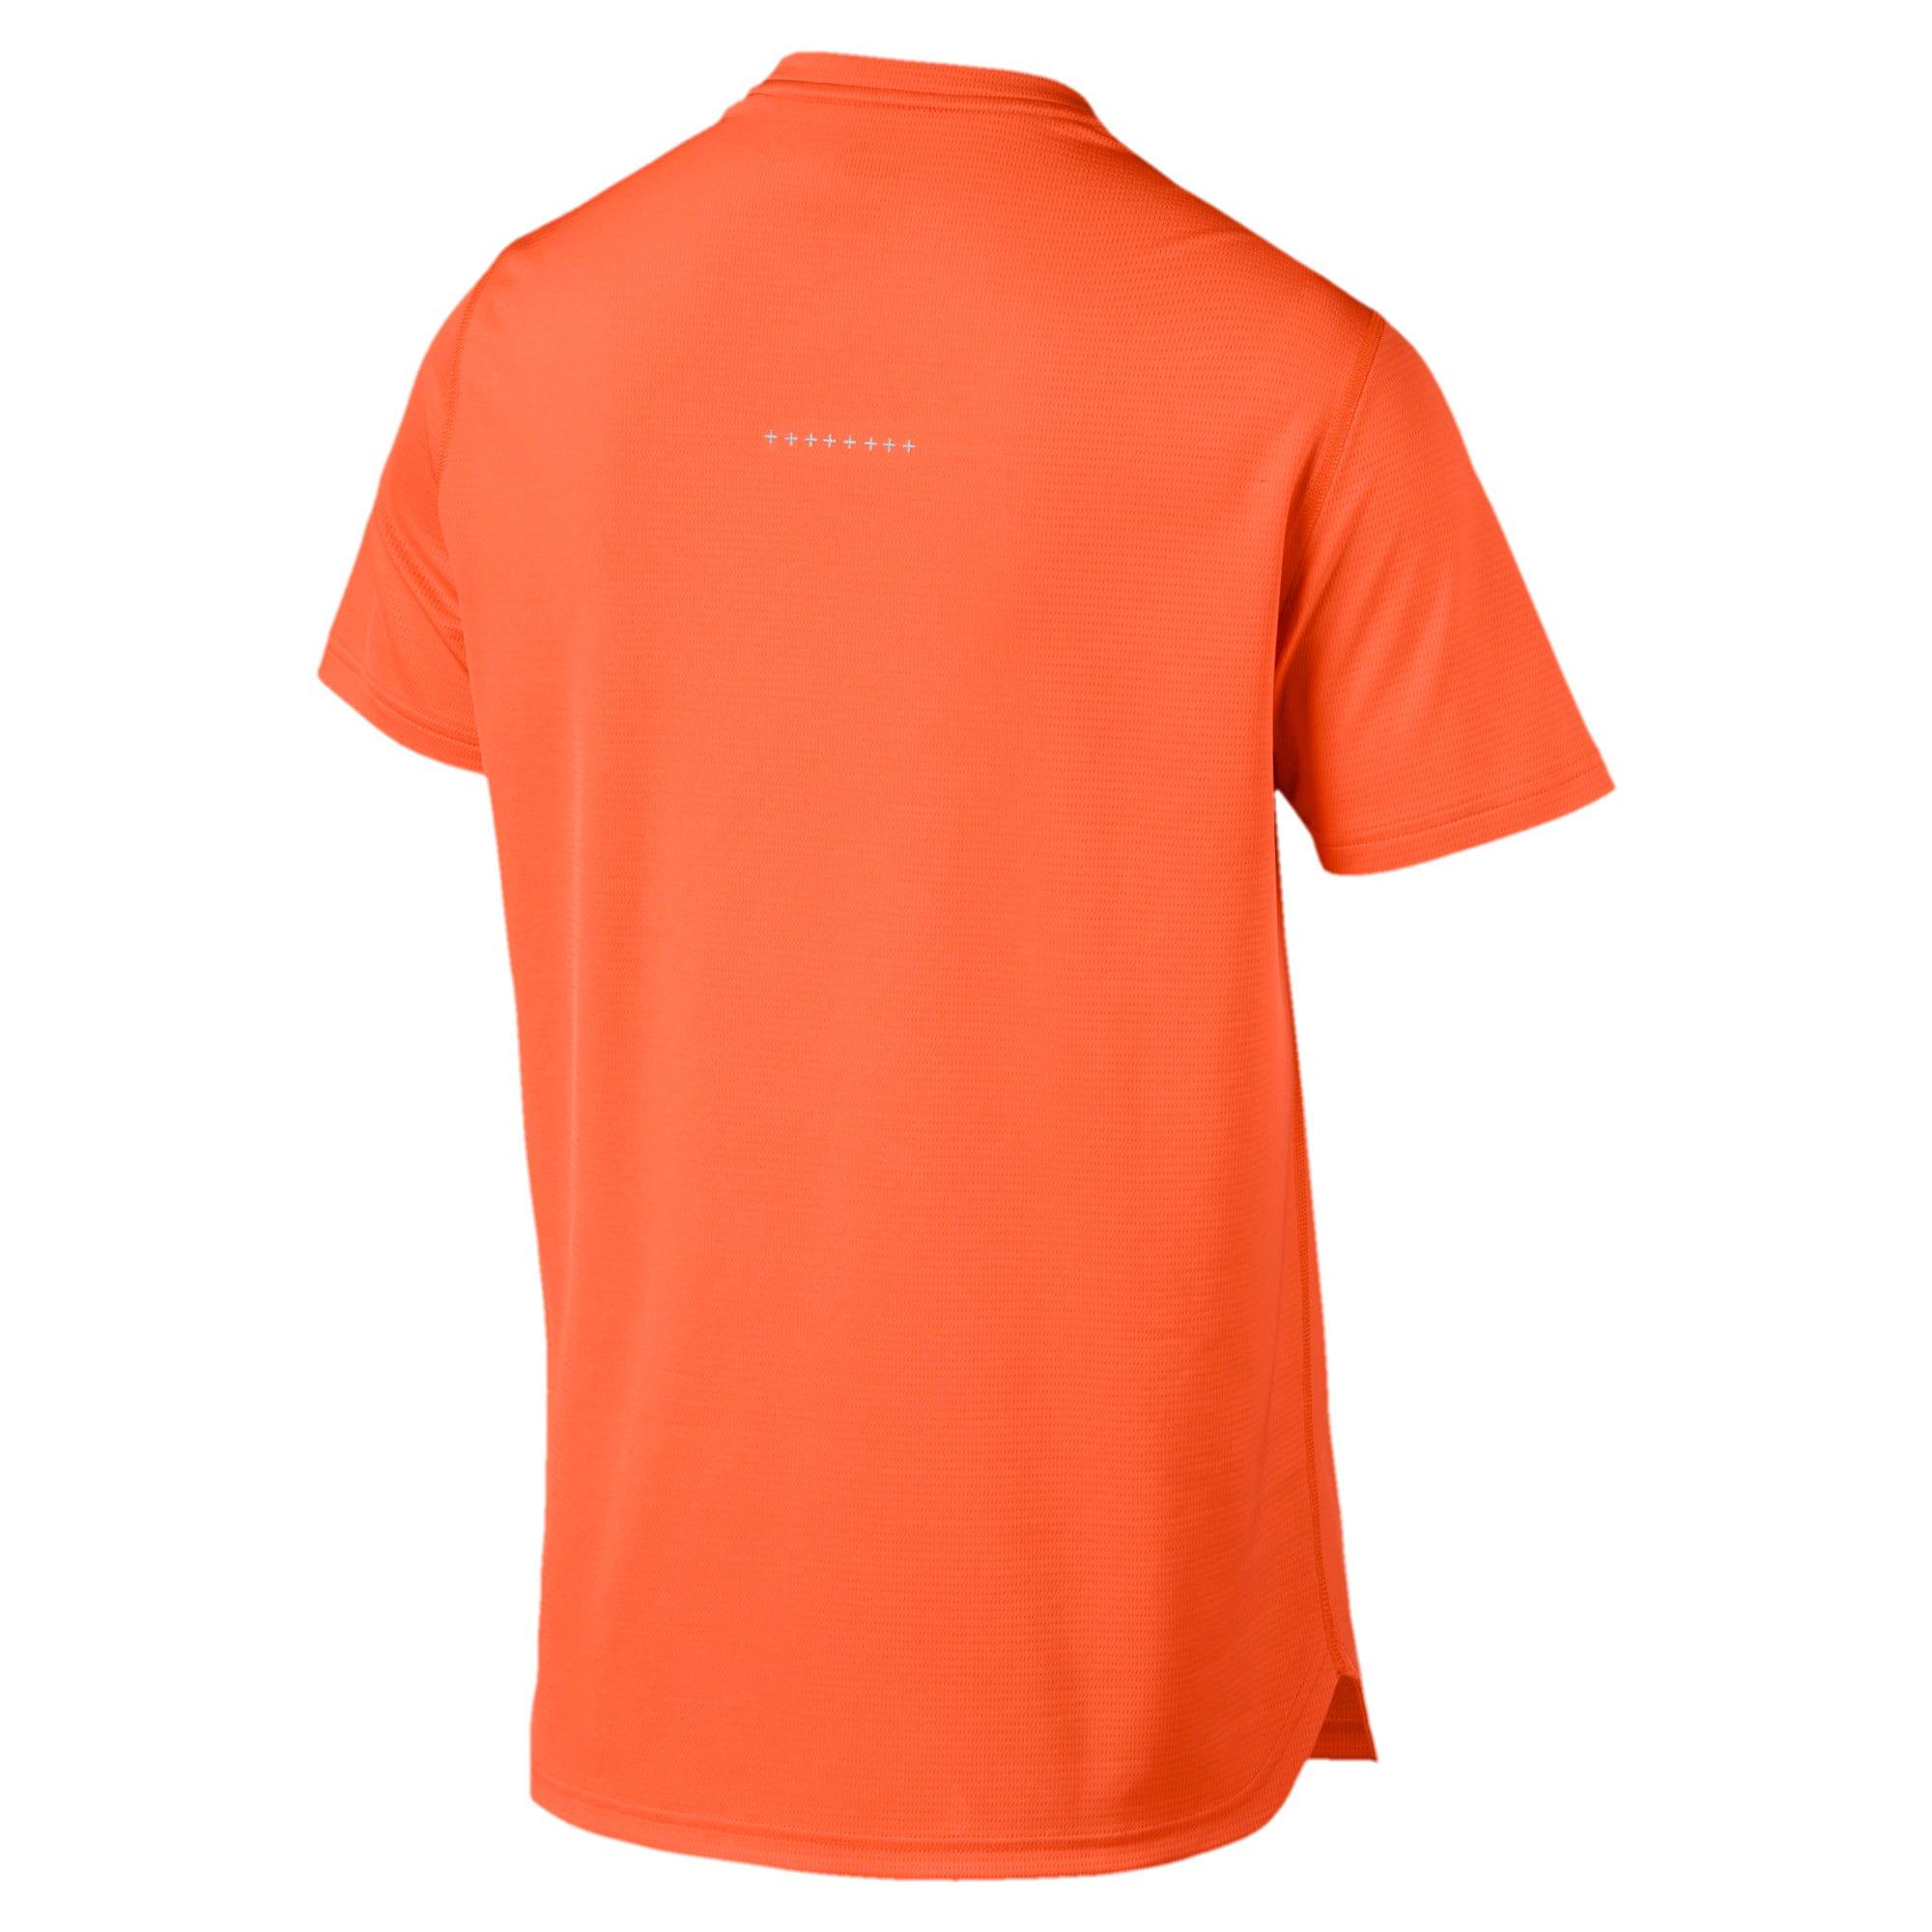 Thumbnail 5 of Running Men's IGNITE Mono T-Shirt, Firecracker, medium-IND